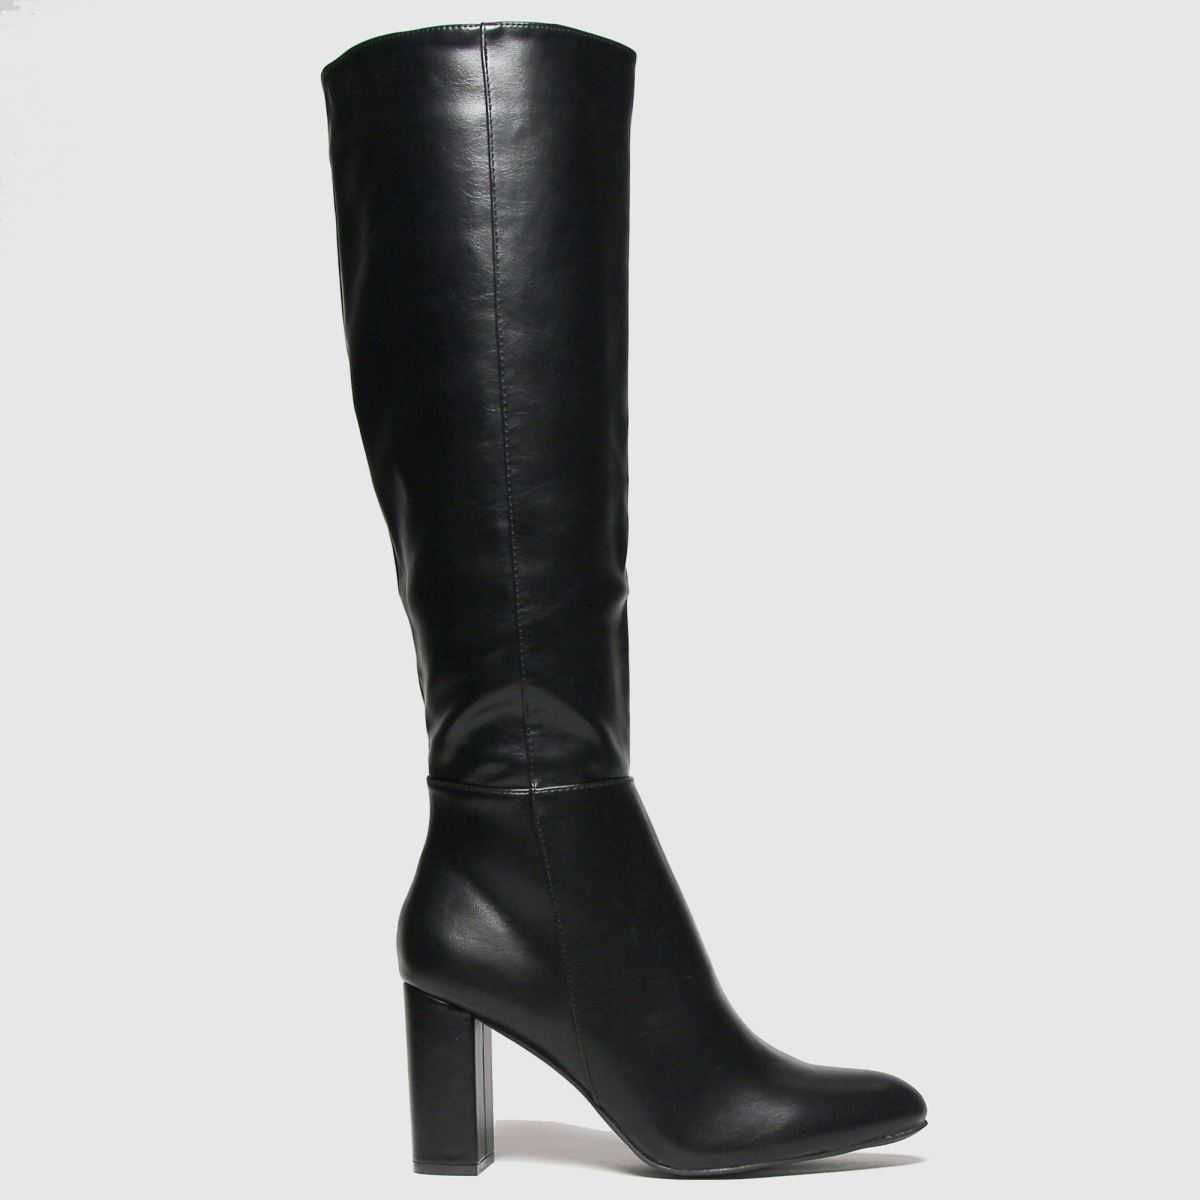 schuh Schuh Black Dakota Pull On Boots